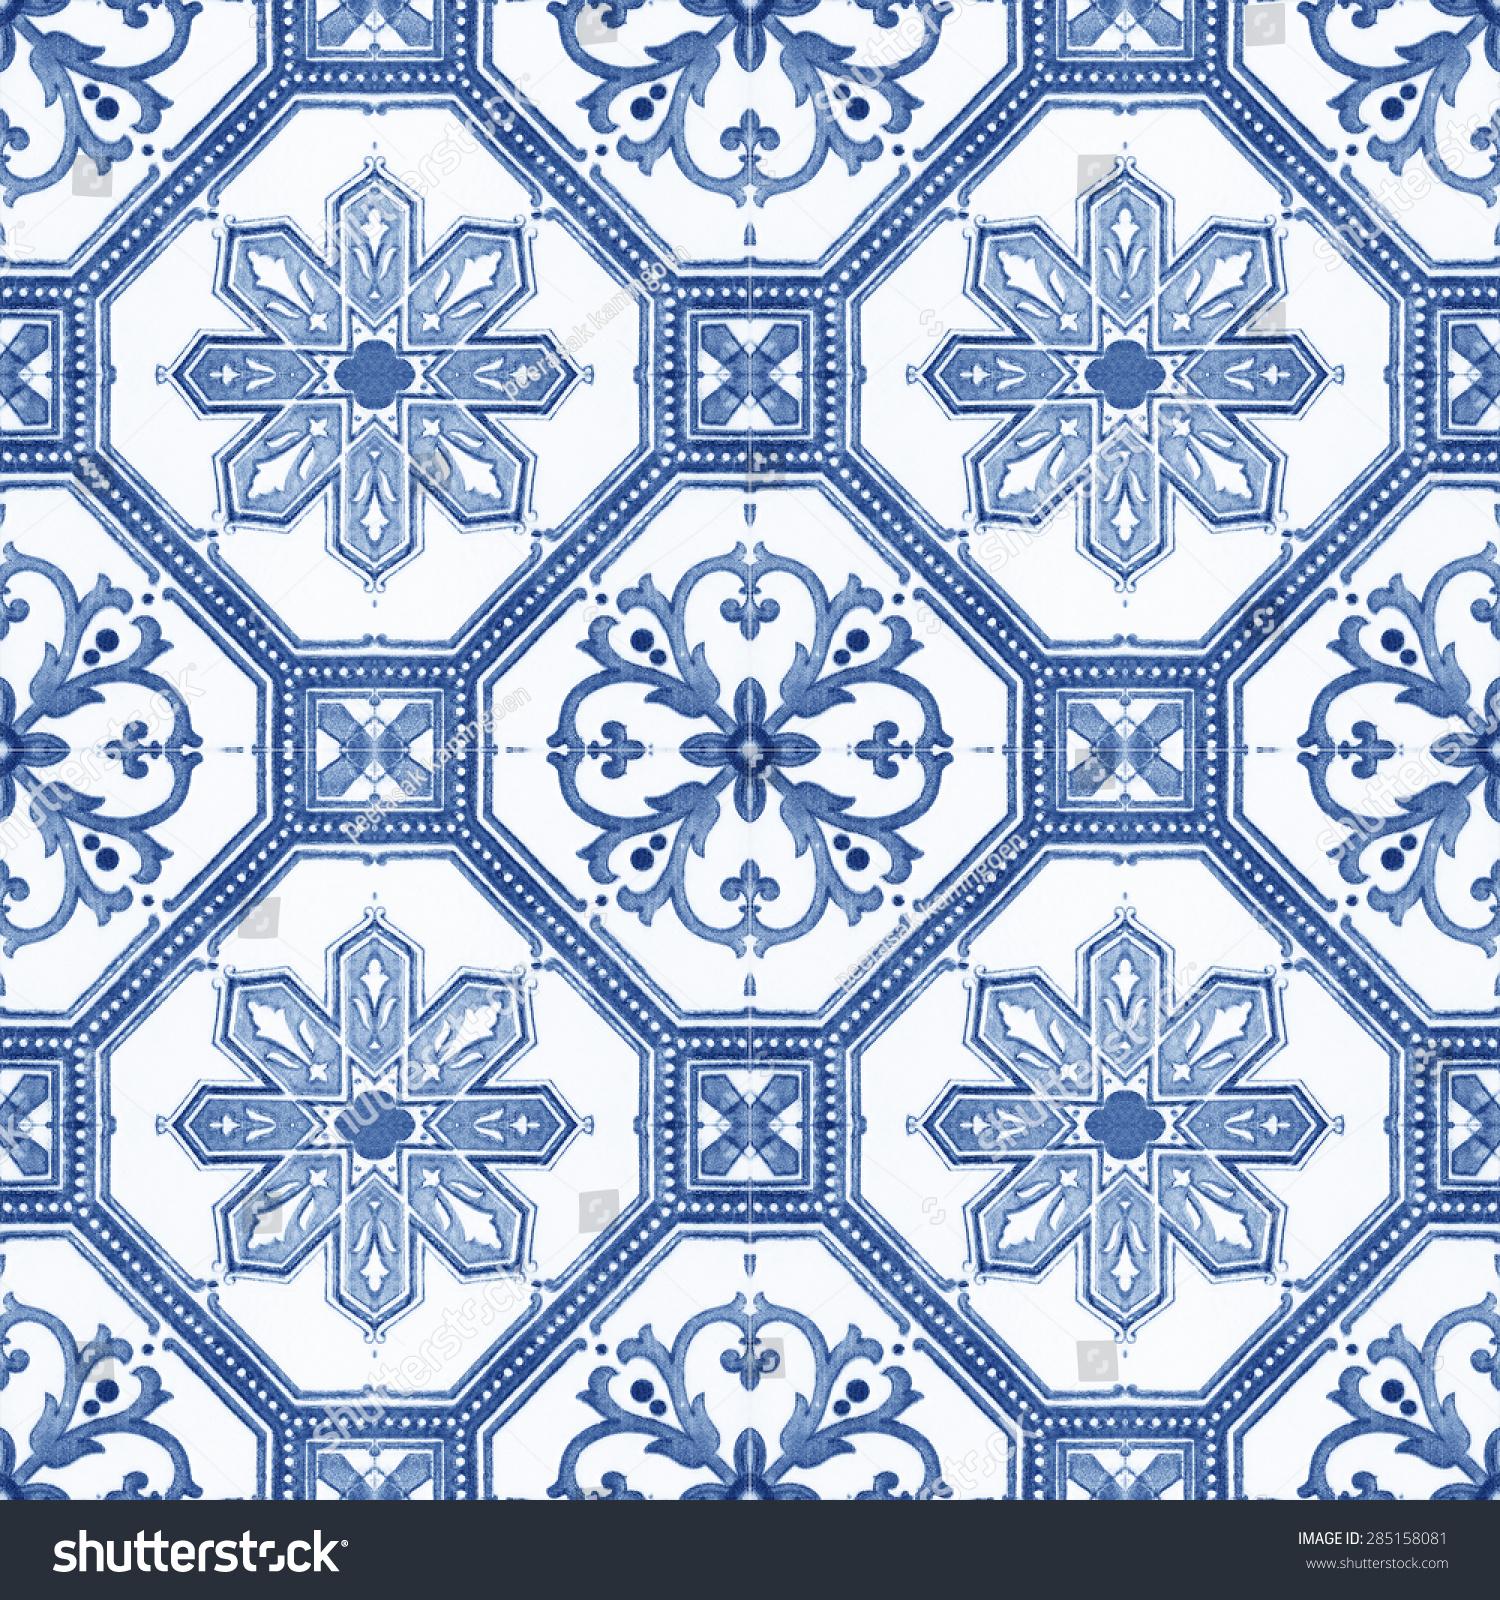 Old Ceramic Tiles Patterns Handicraft Thailand Stock Photo (Edit Now ...